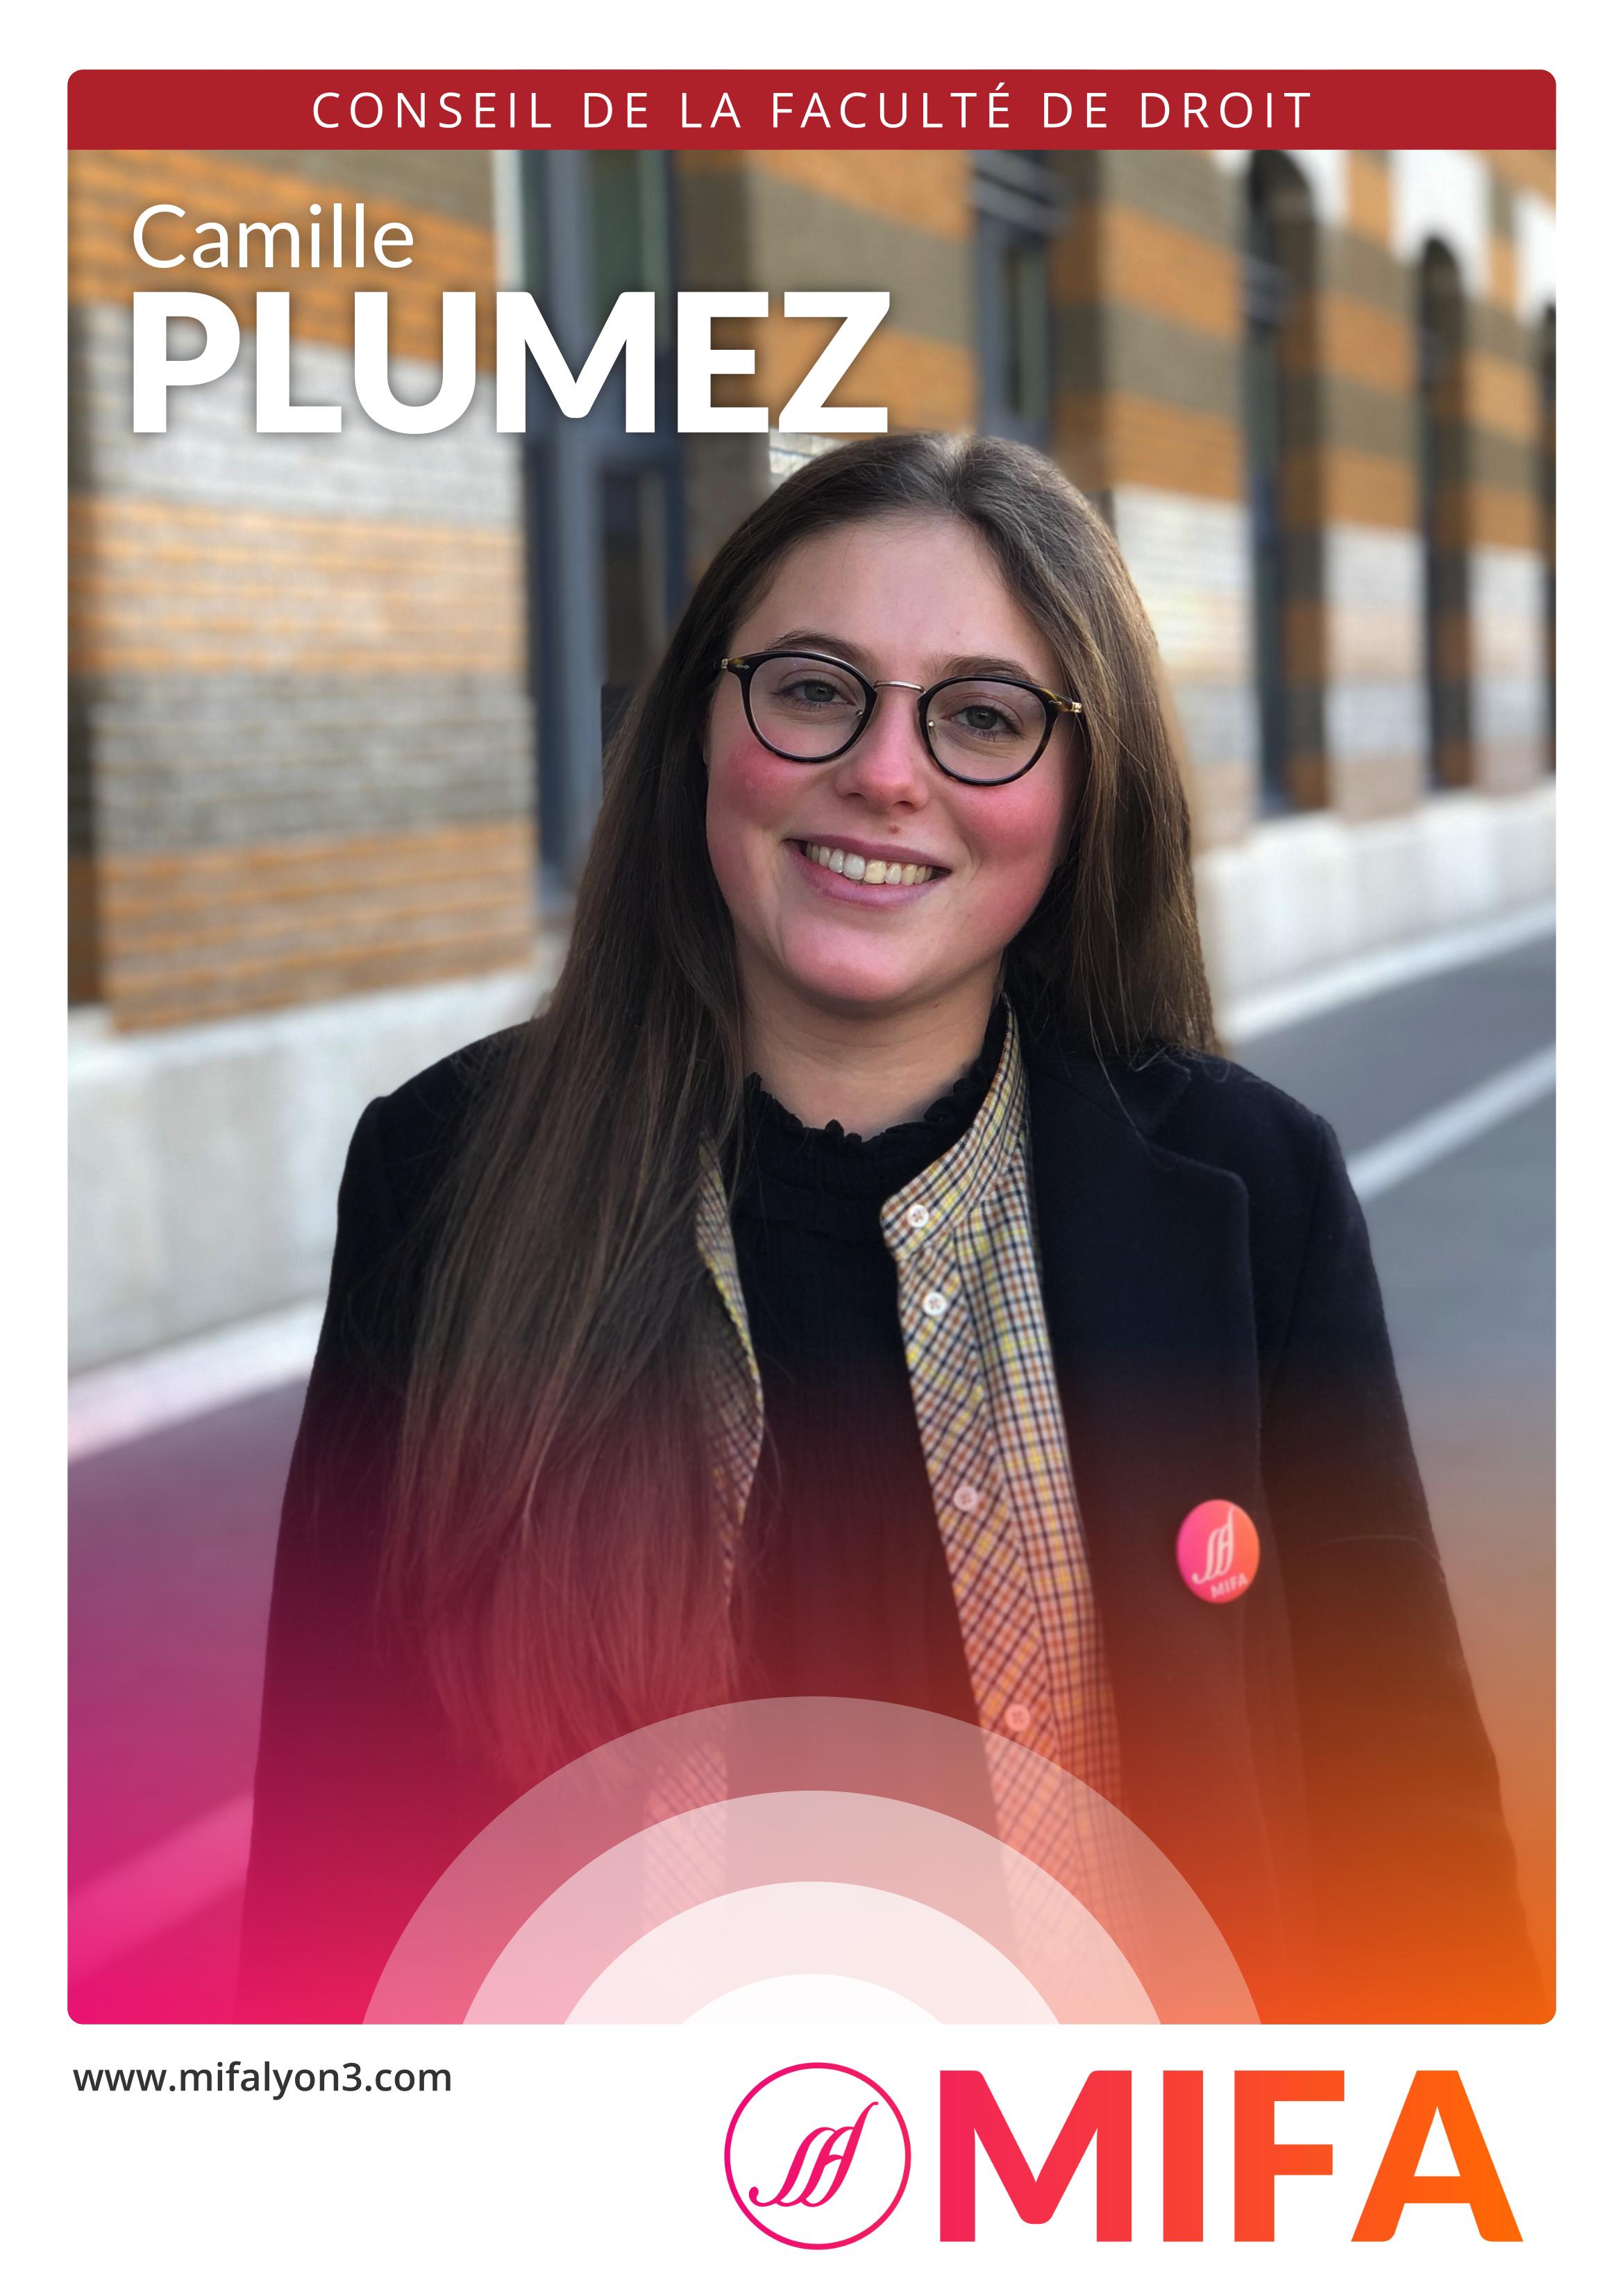 Camille PLUMEZ